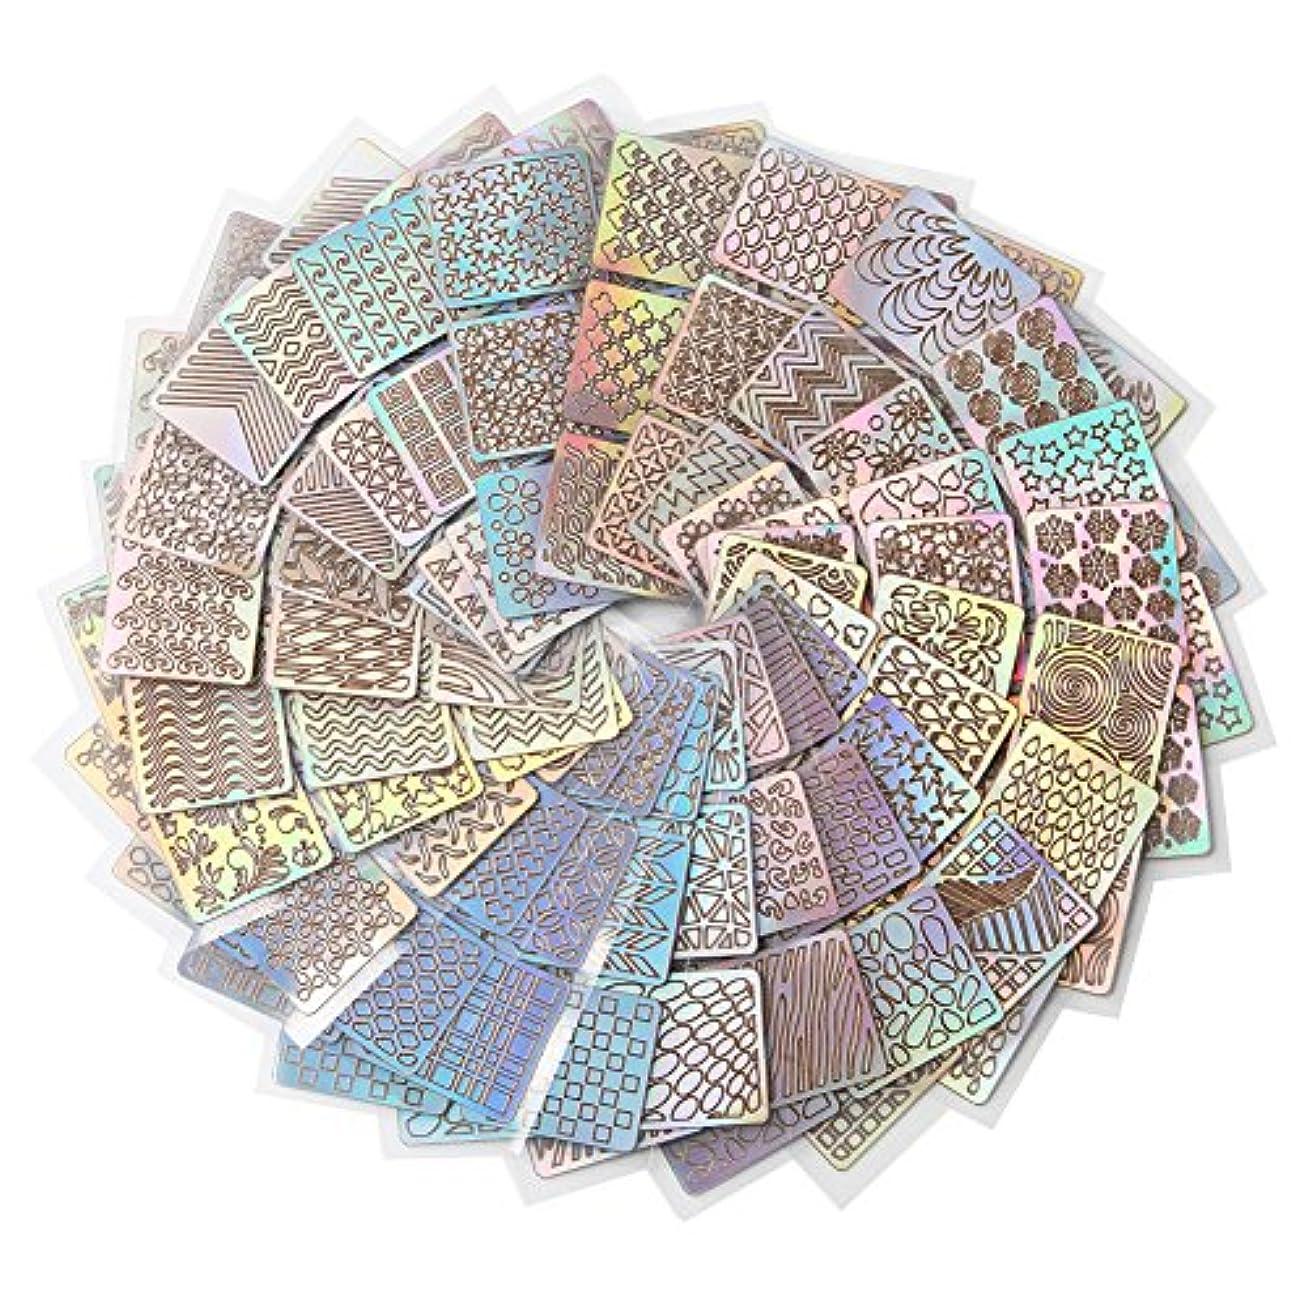 Demiawaking ネイル用装飾 可愛いネイル飾り テープ ネイル パーツ ネイルーシール 今年流行ネイティブ柄ネイルステッカー 24枚セット